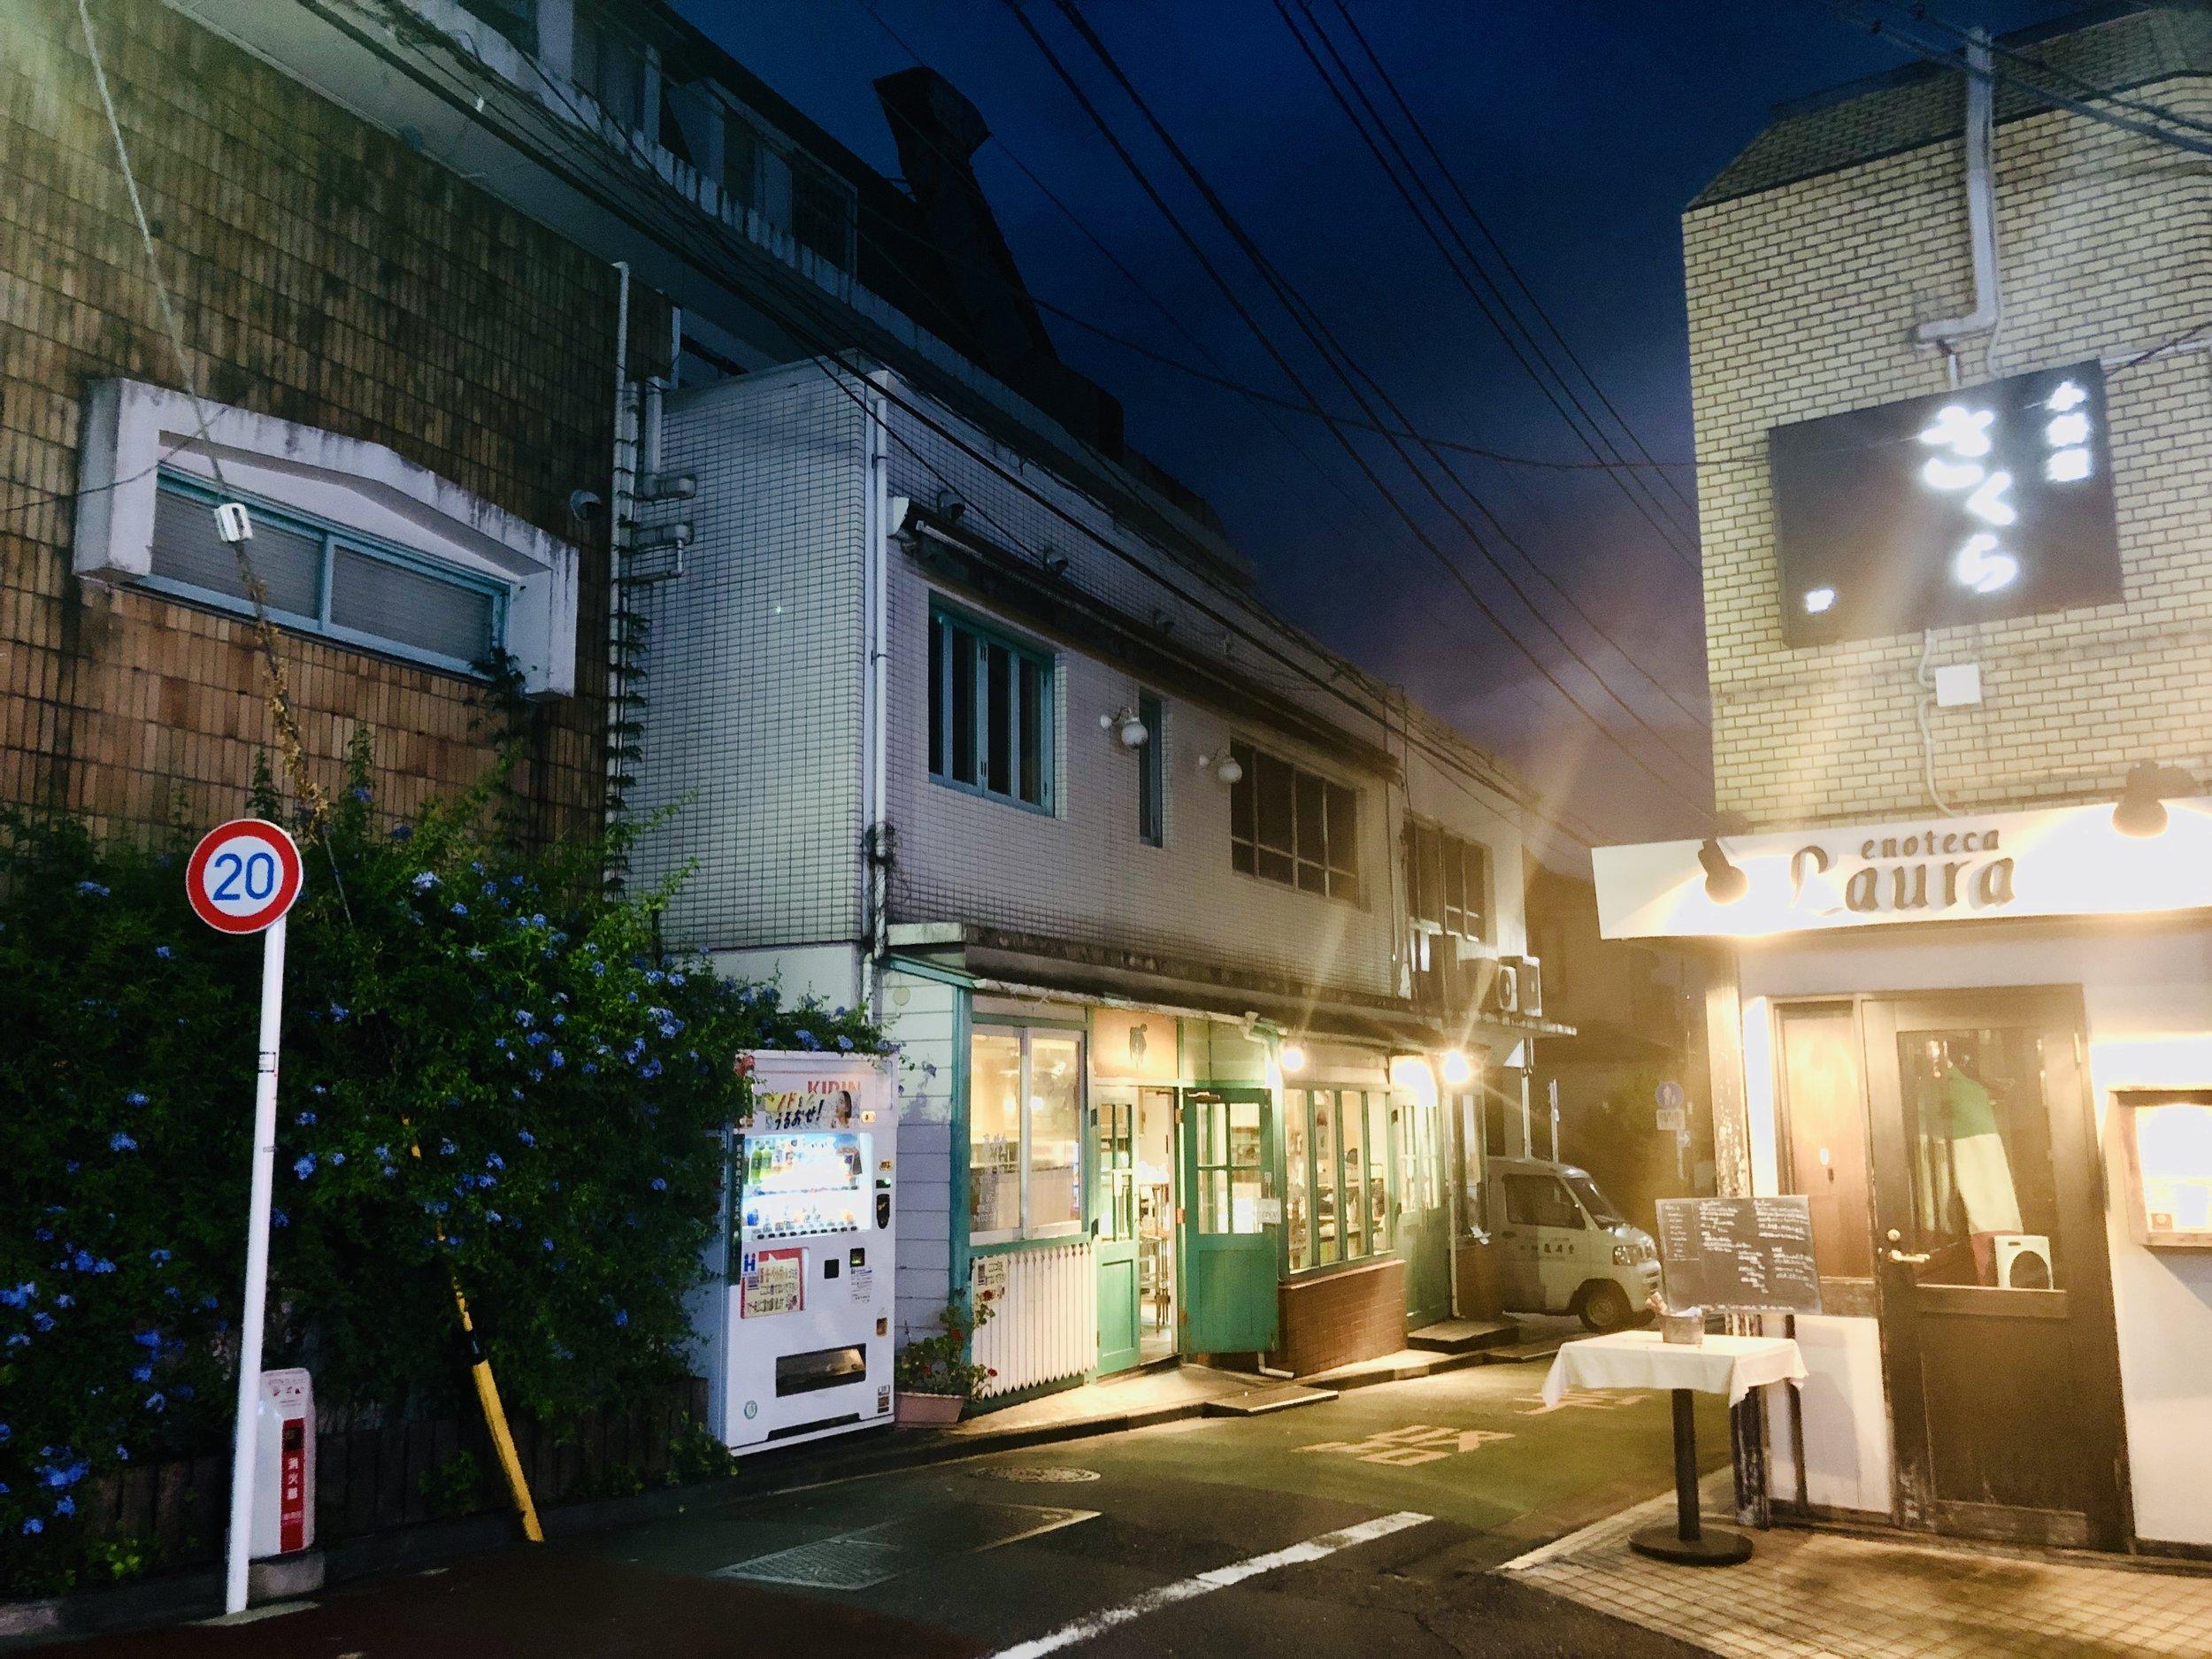 赤城坂 by Yohei